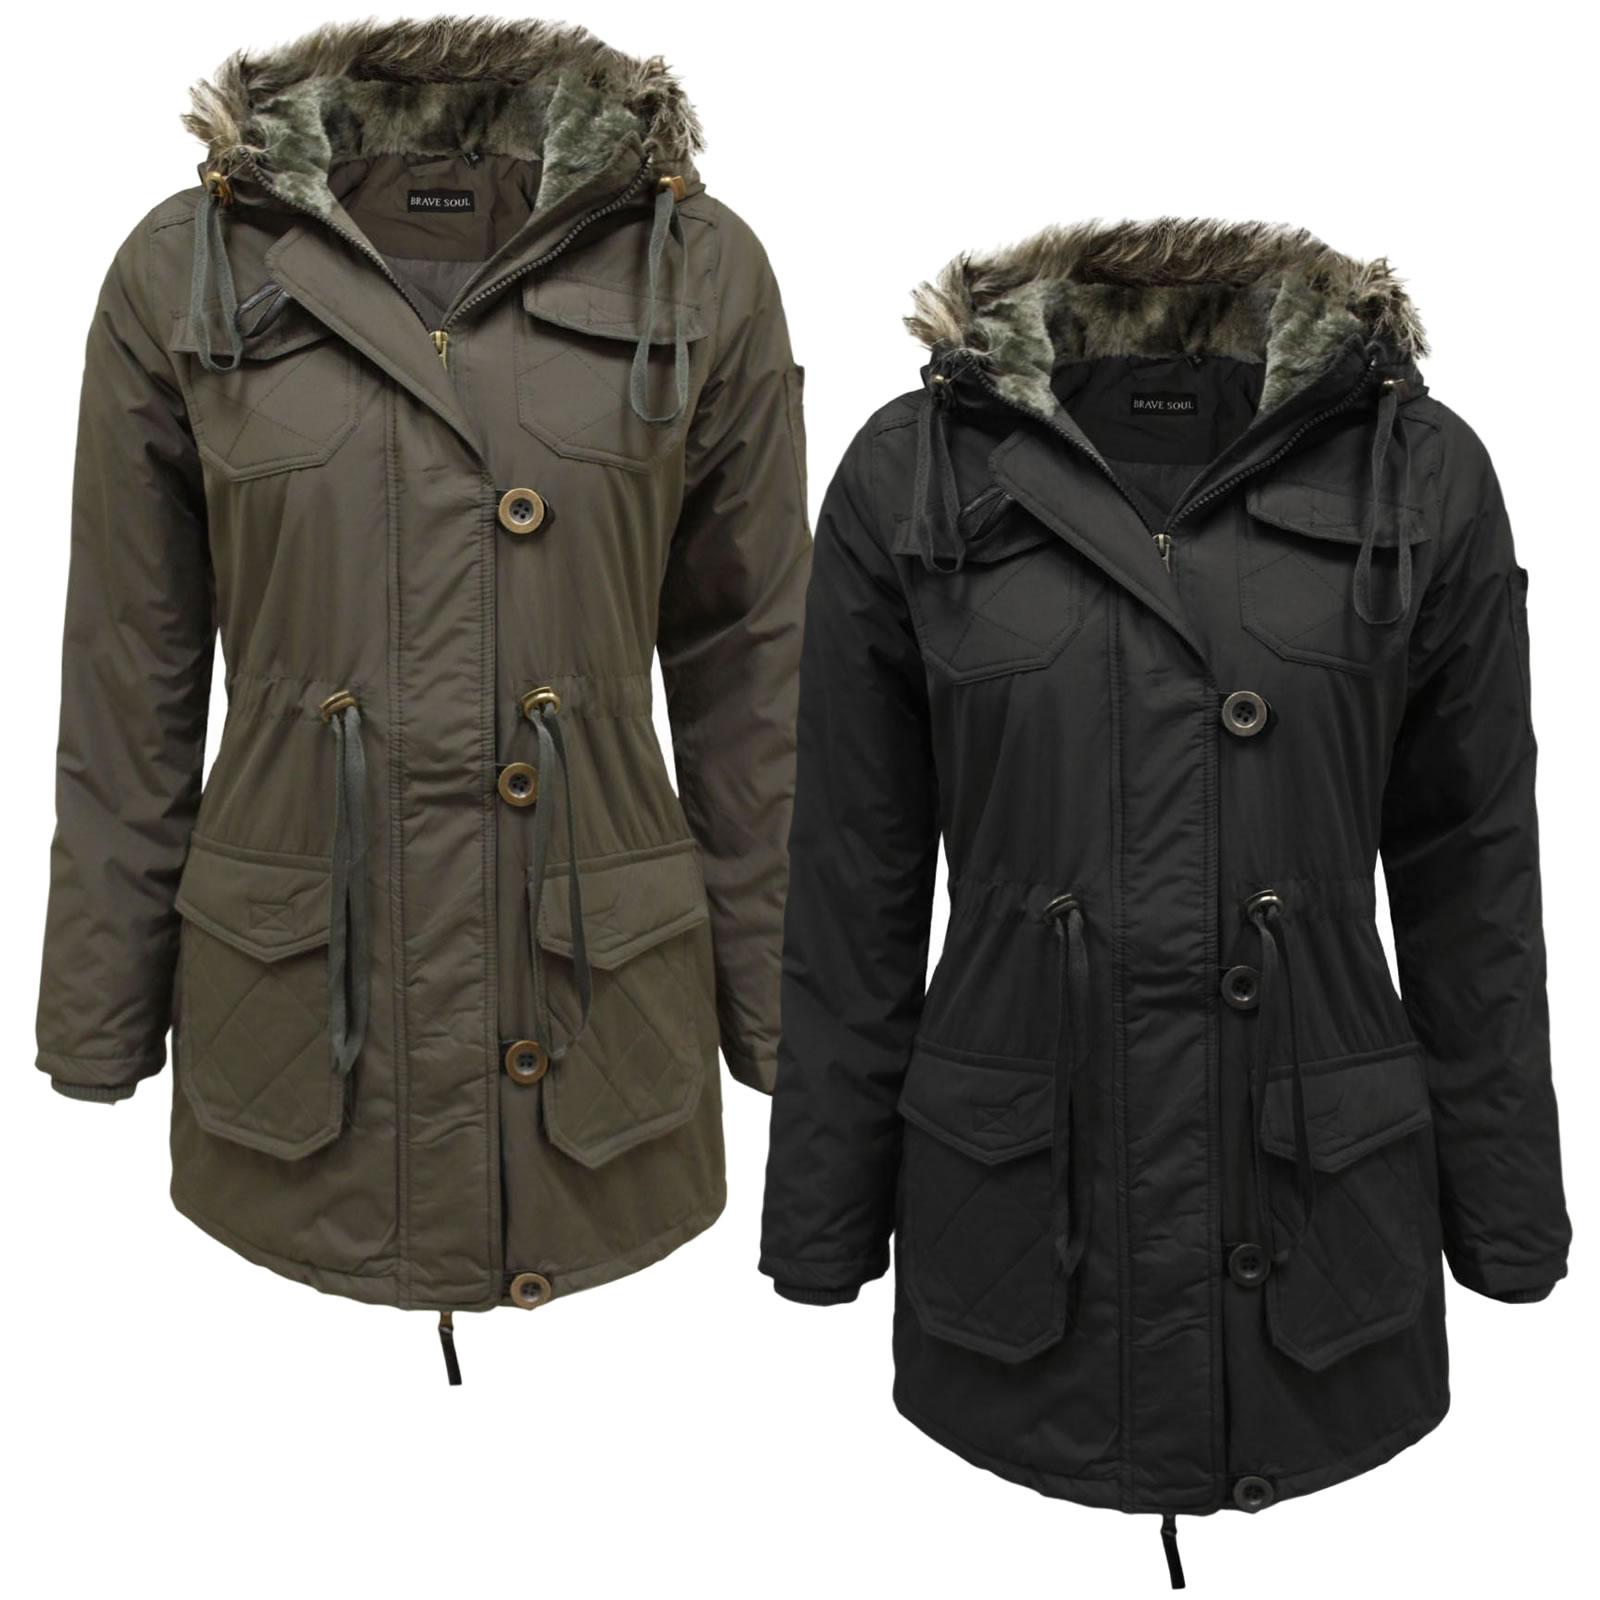 6647e7d2fd Details about Womens Brave Soul Camden Faux Fur Quilted Parka Winter Coat |  Clearance Item